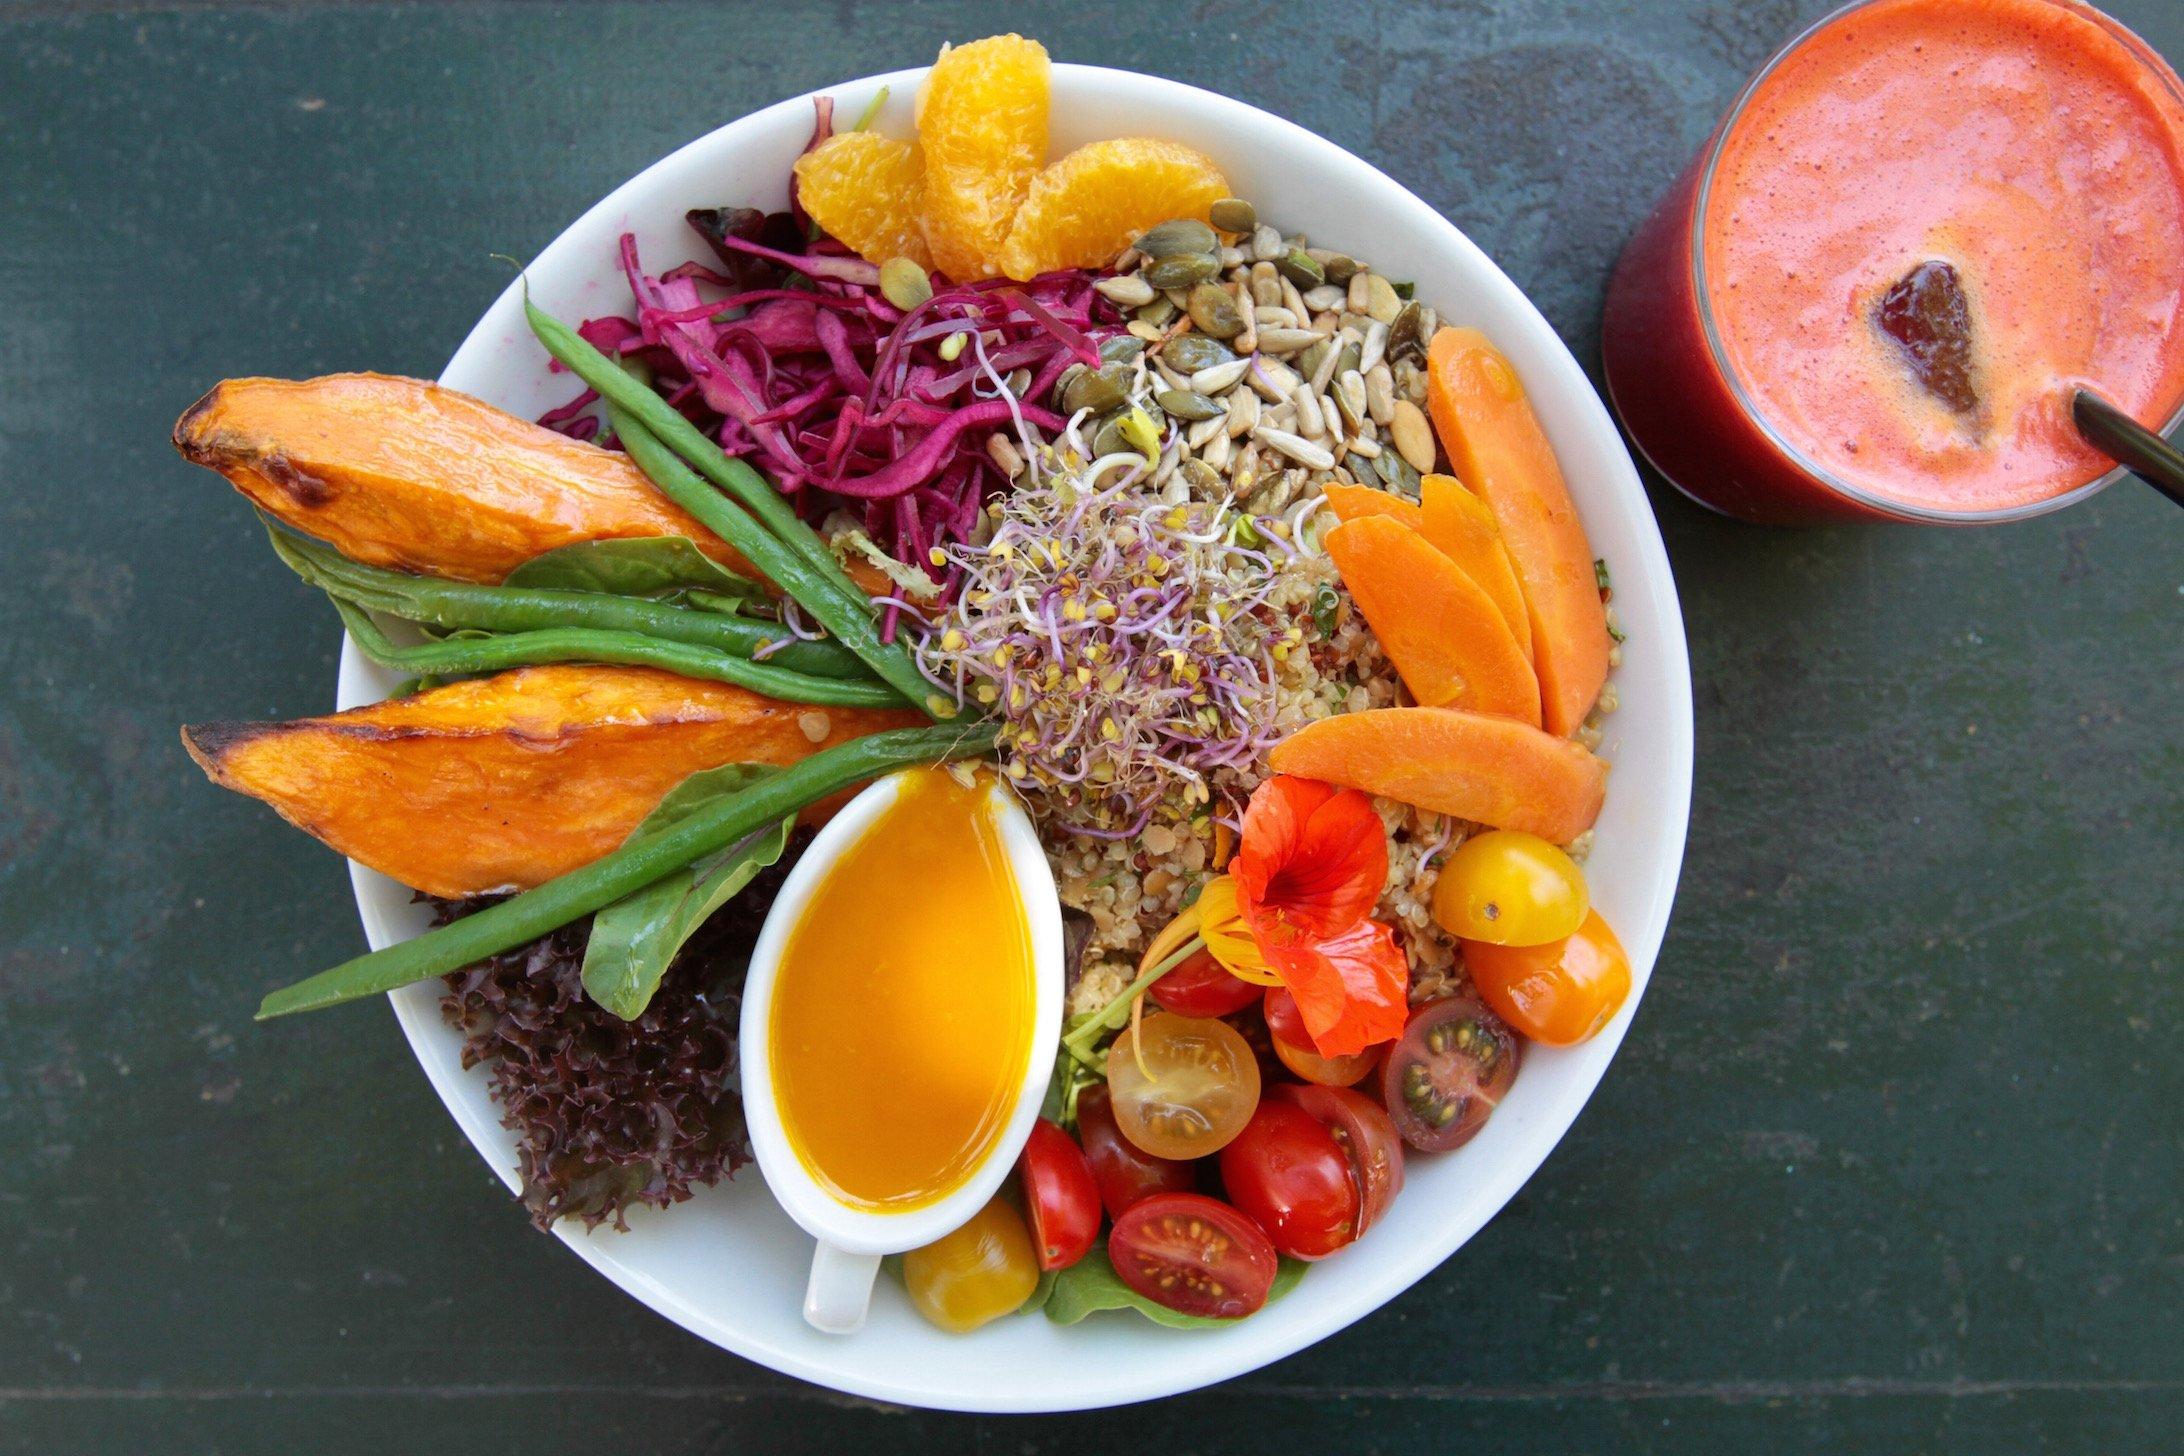 La Paloma salad by Tanja Ting-Pure Goodness